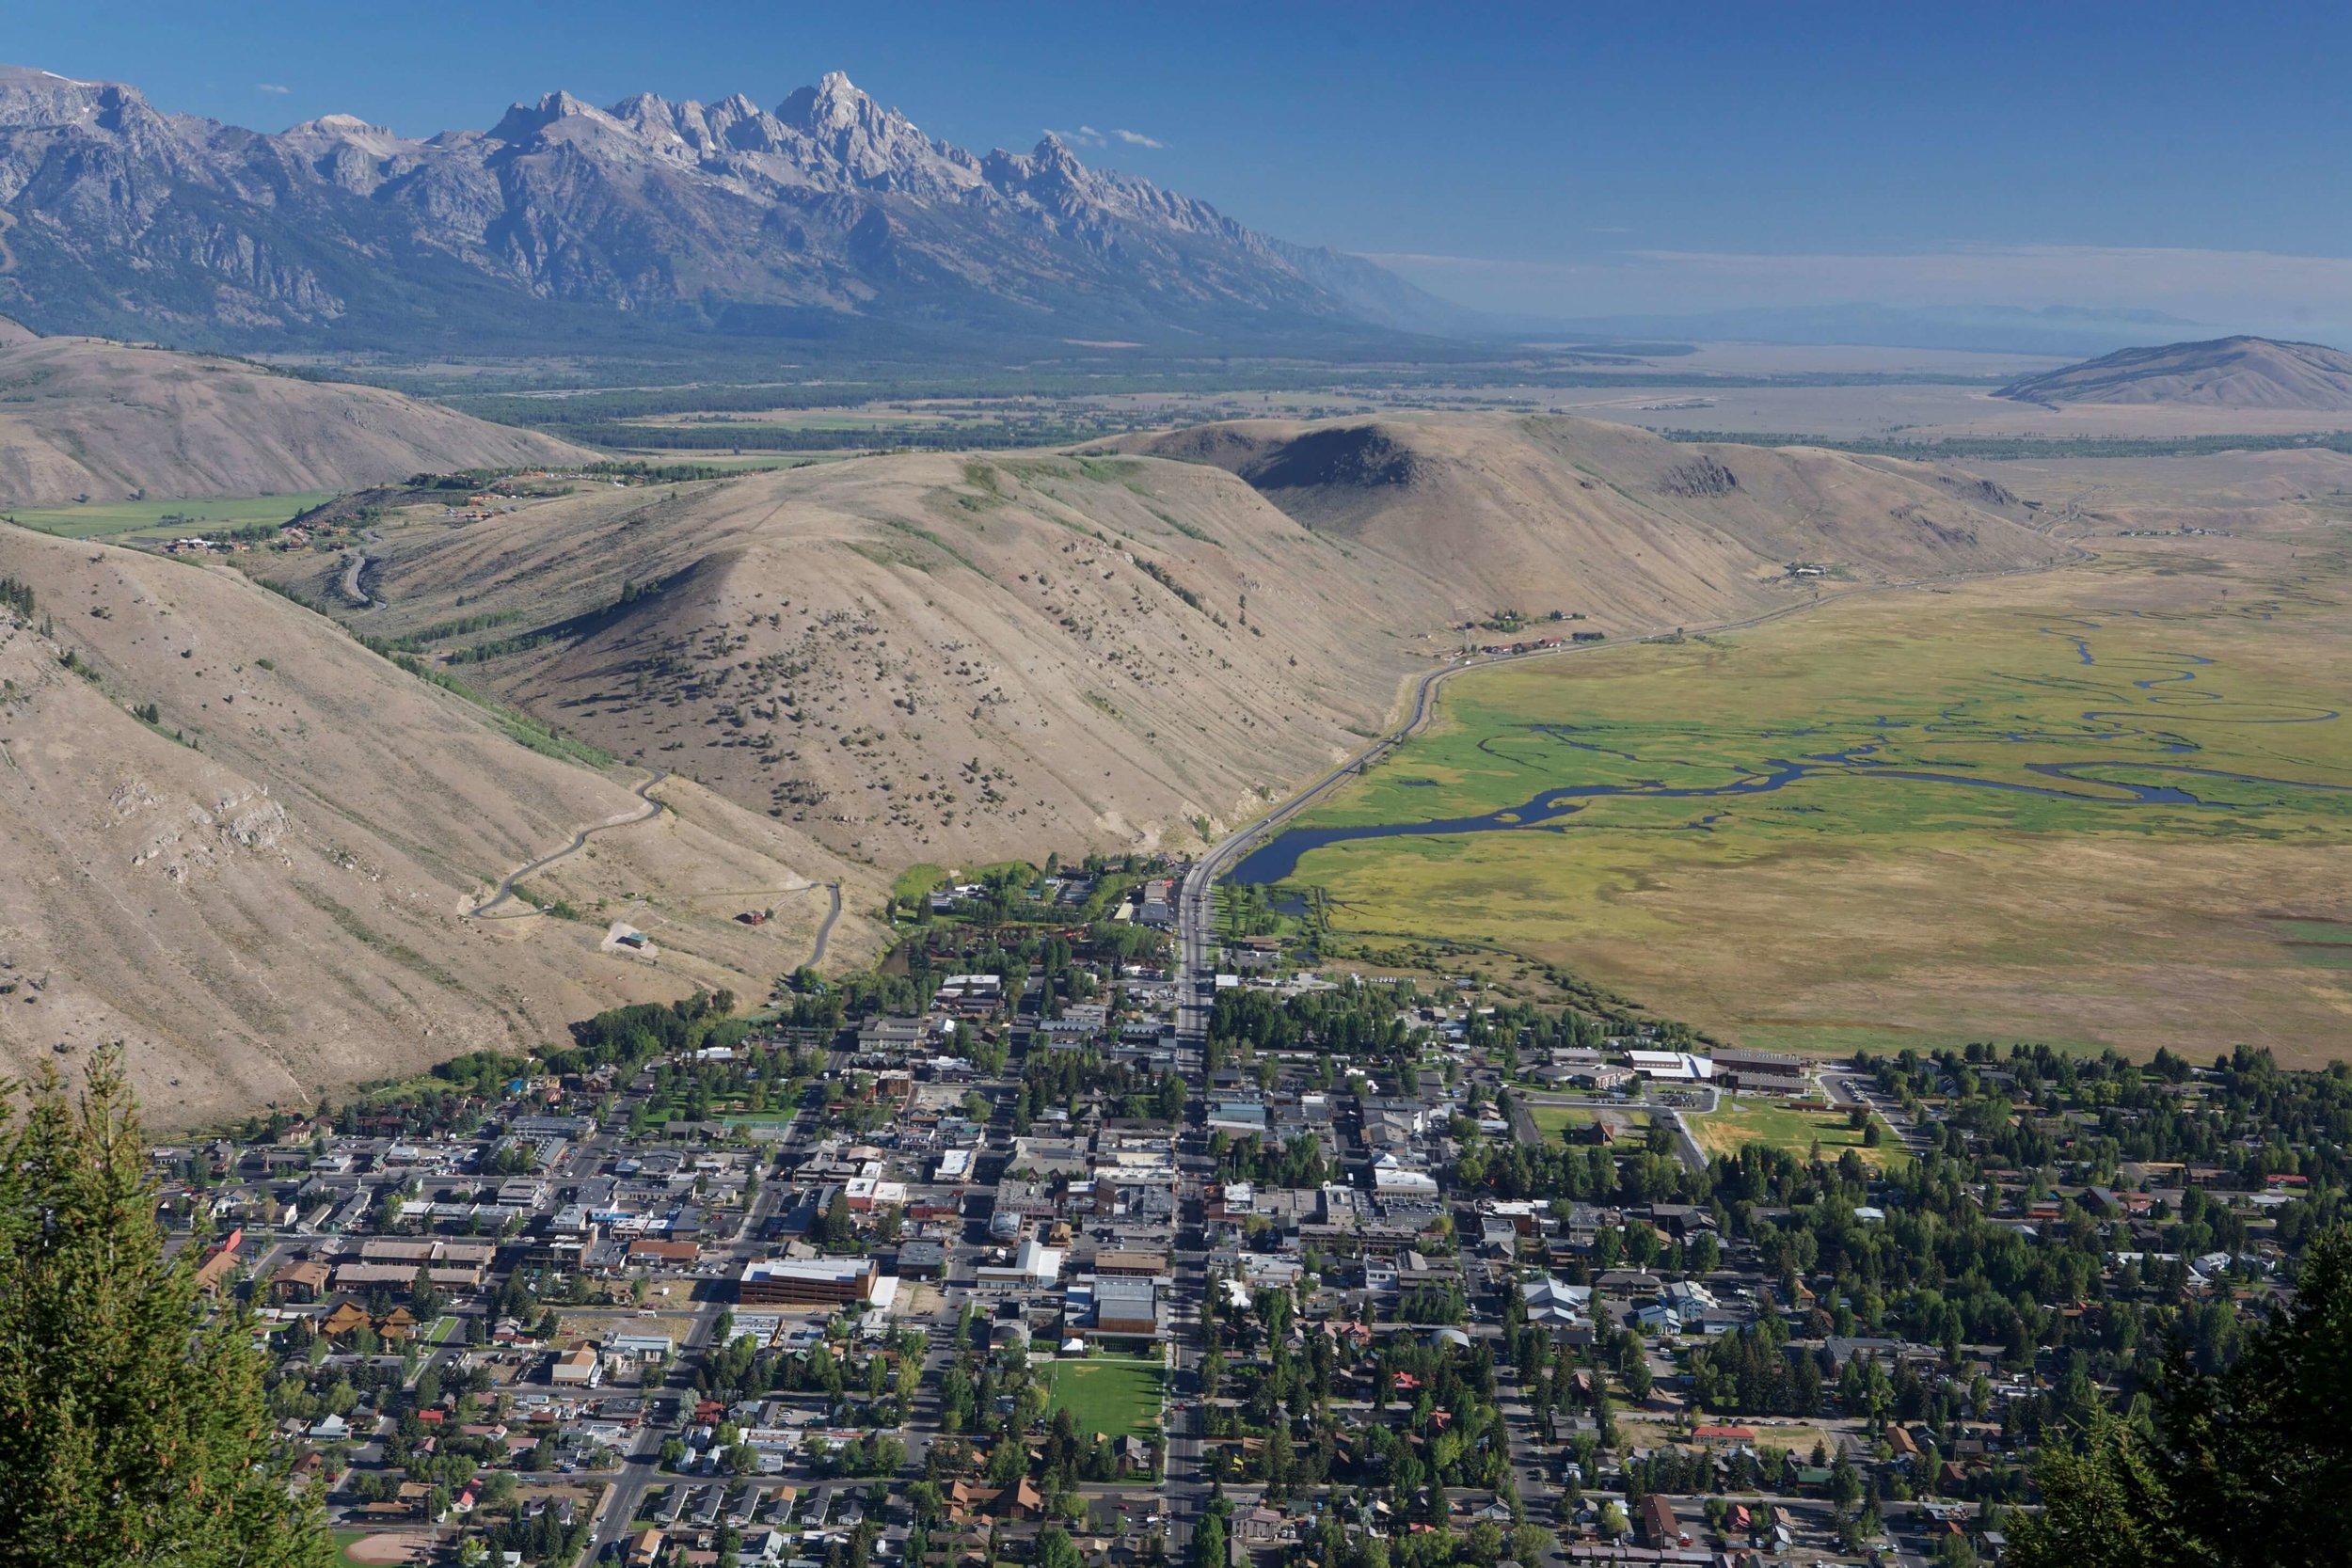 10-Home-Ranch-Welcome-Center-The Sibbett Group-Charlie Craighead.jpg